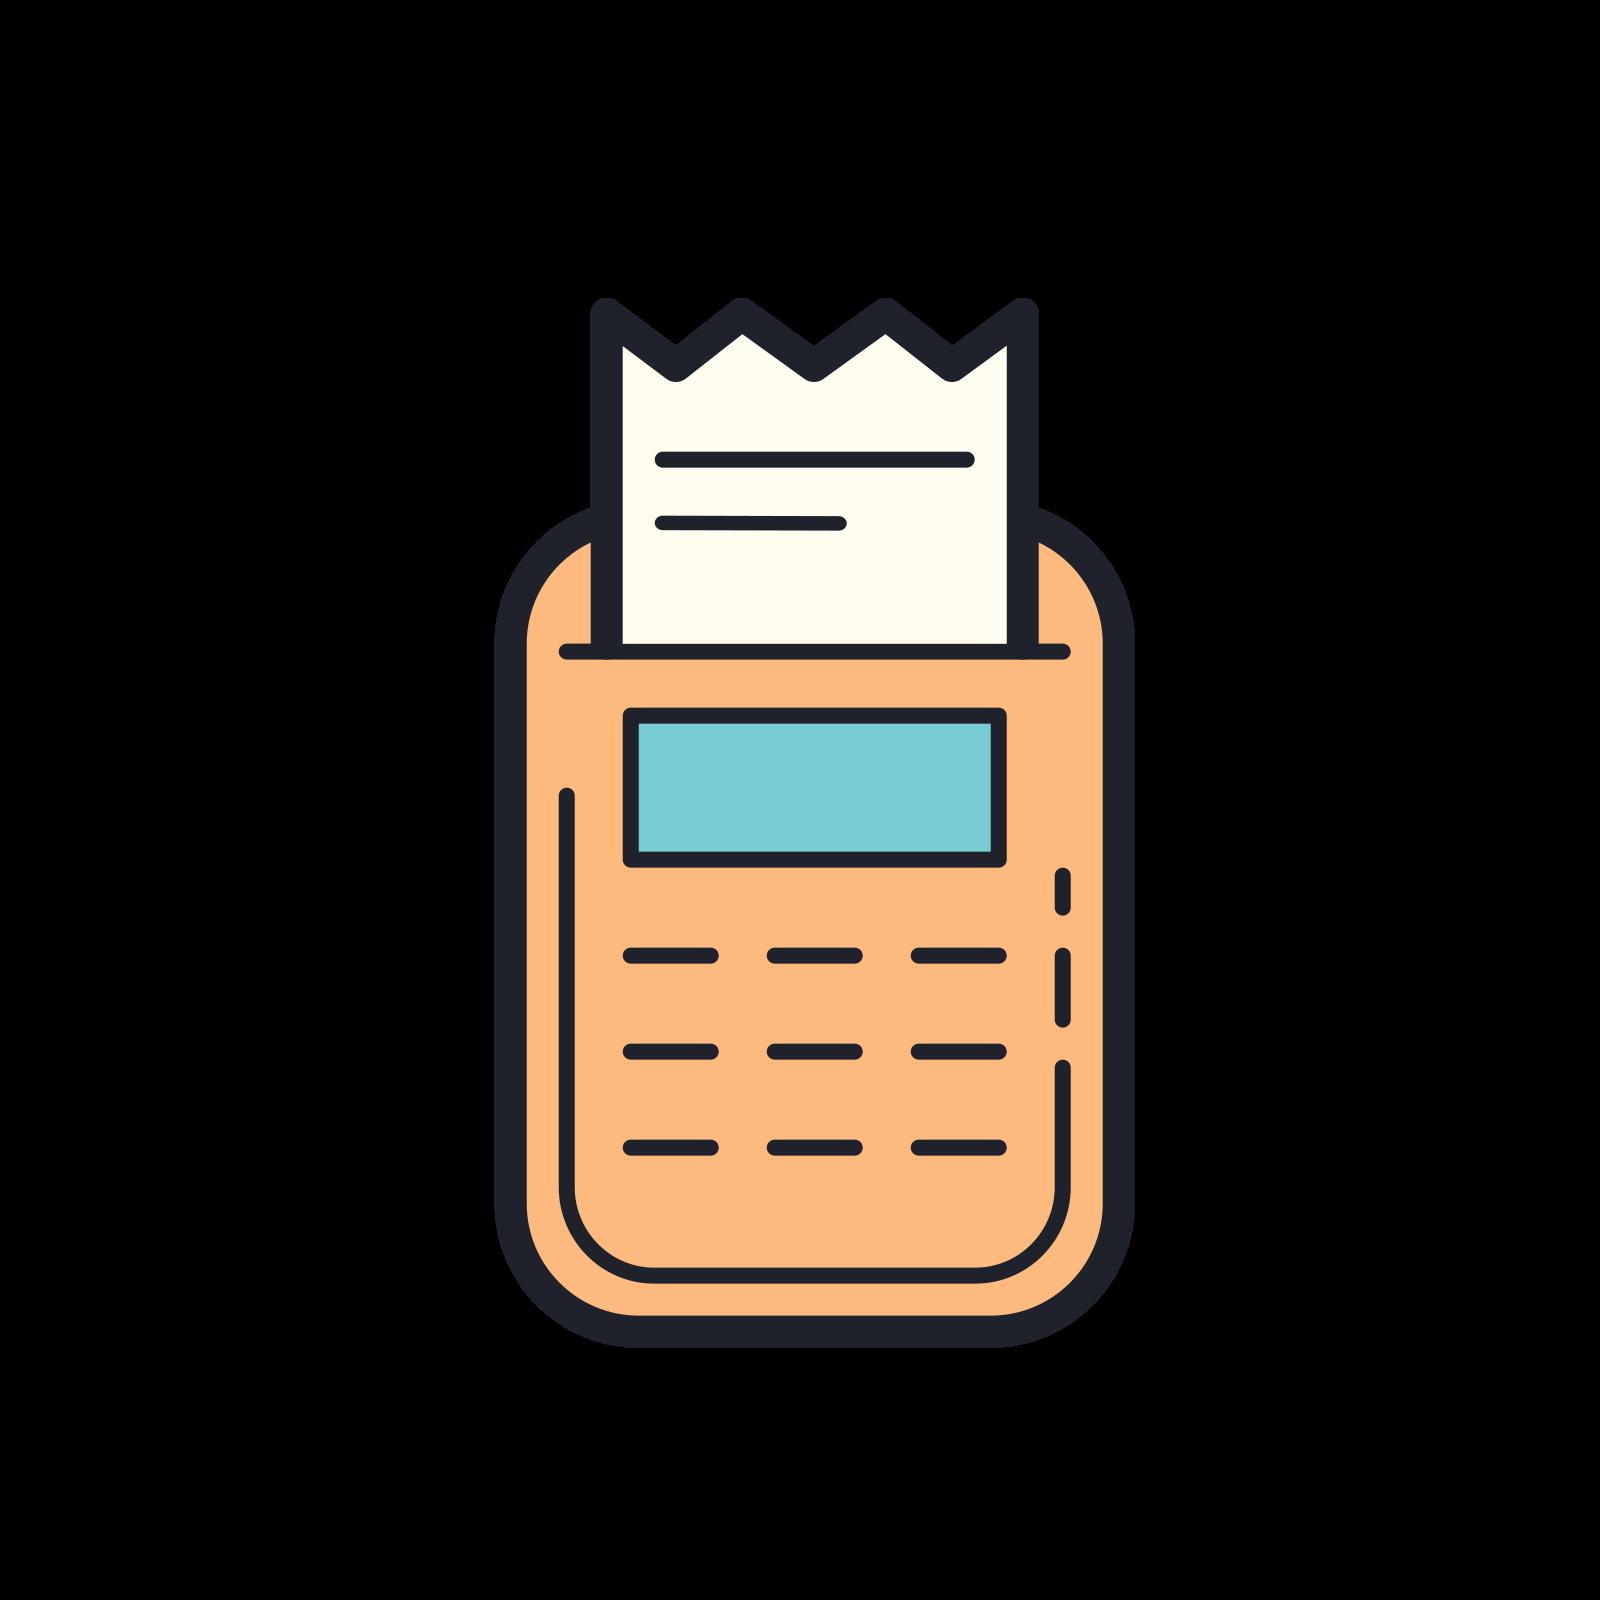 Billing Machine icon